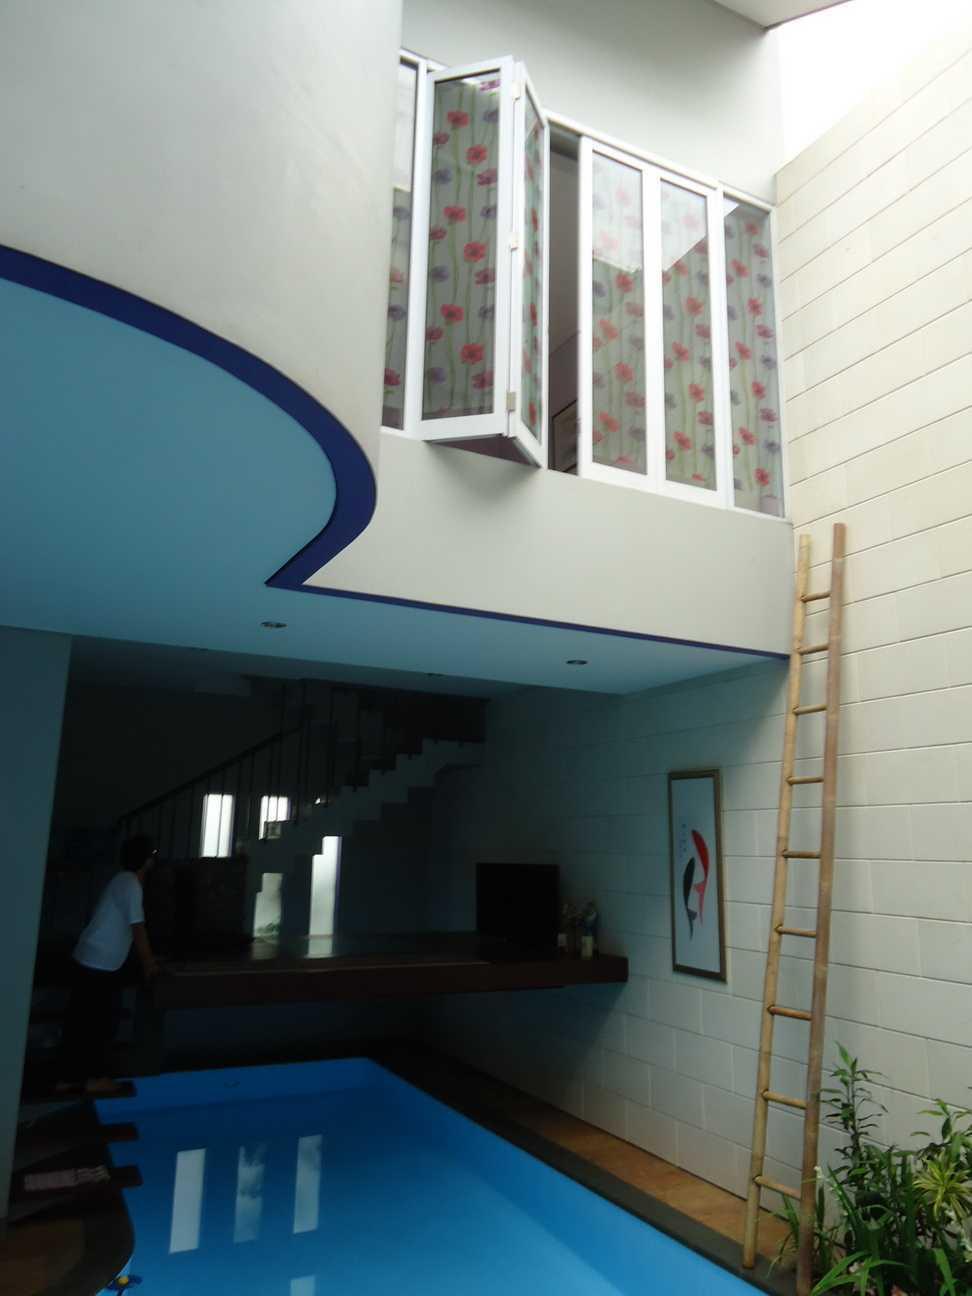 Budi Dharma The Relaxation House Gelong Selatan - Tomang Gelong Selatan - Tomang Gelong-Selatan-04   23853